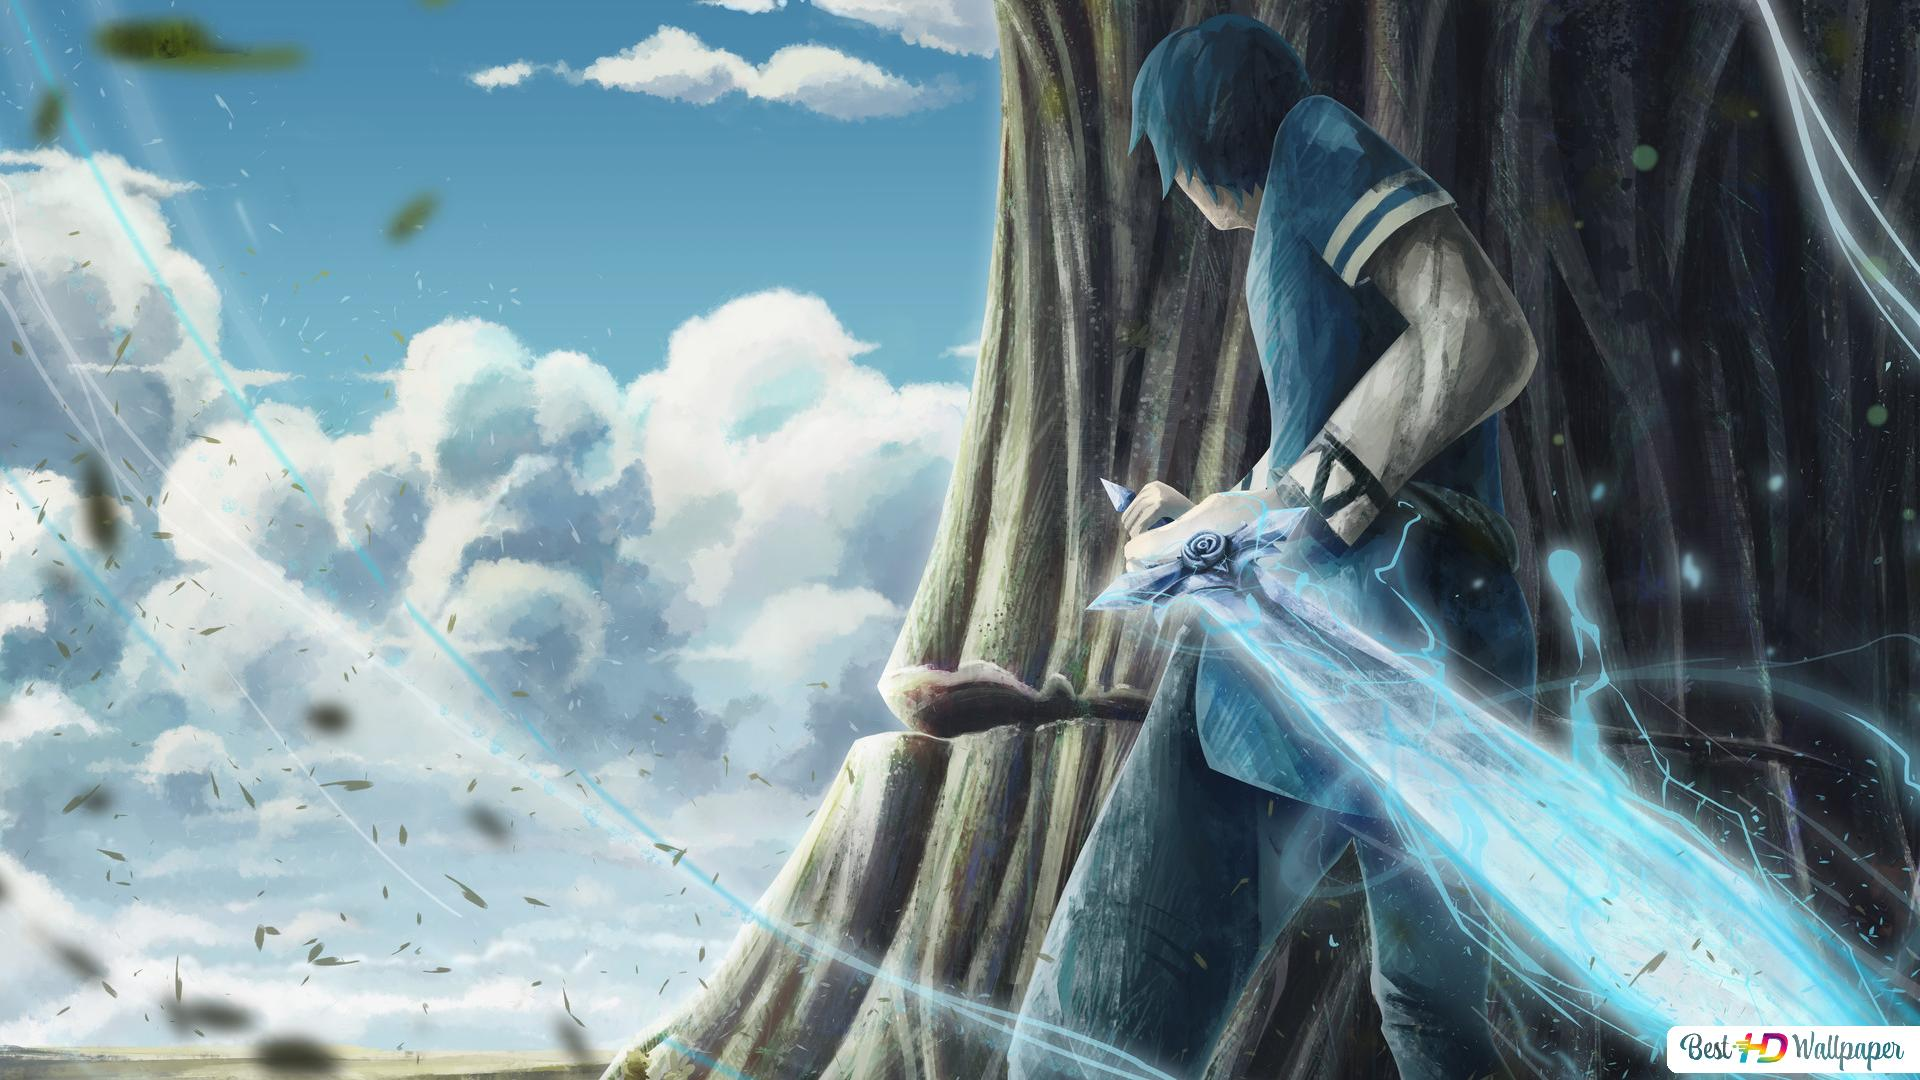 Sword Art Online Alicization Kirito Kazuto Kirigaya Blue Rose